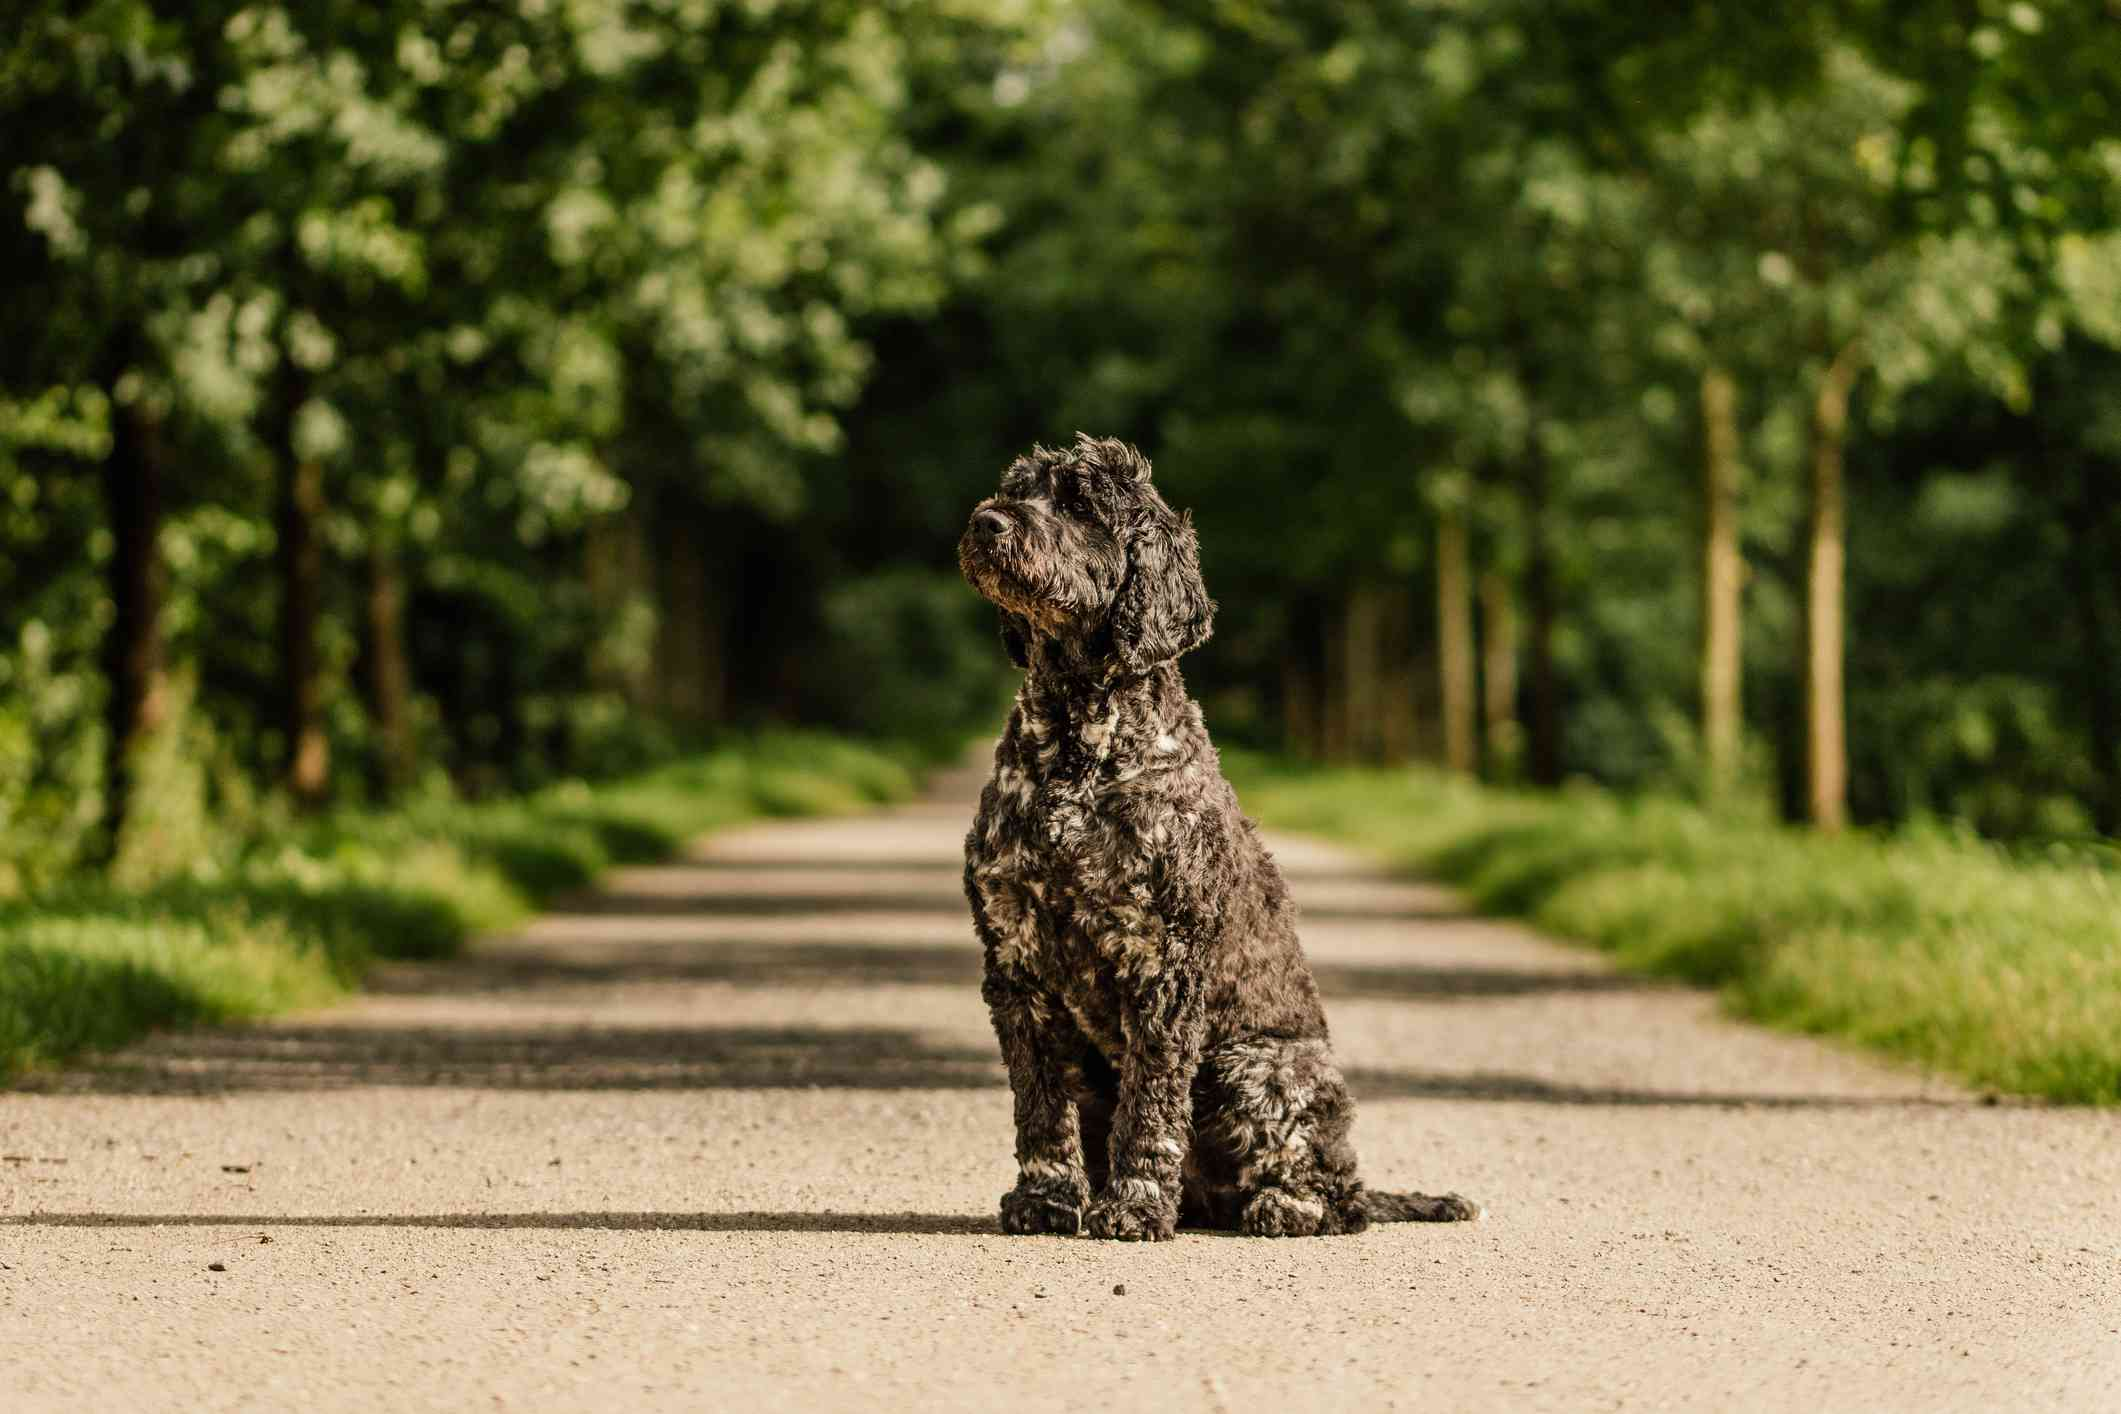 A medium-sized, black dog standing on a path.